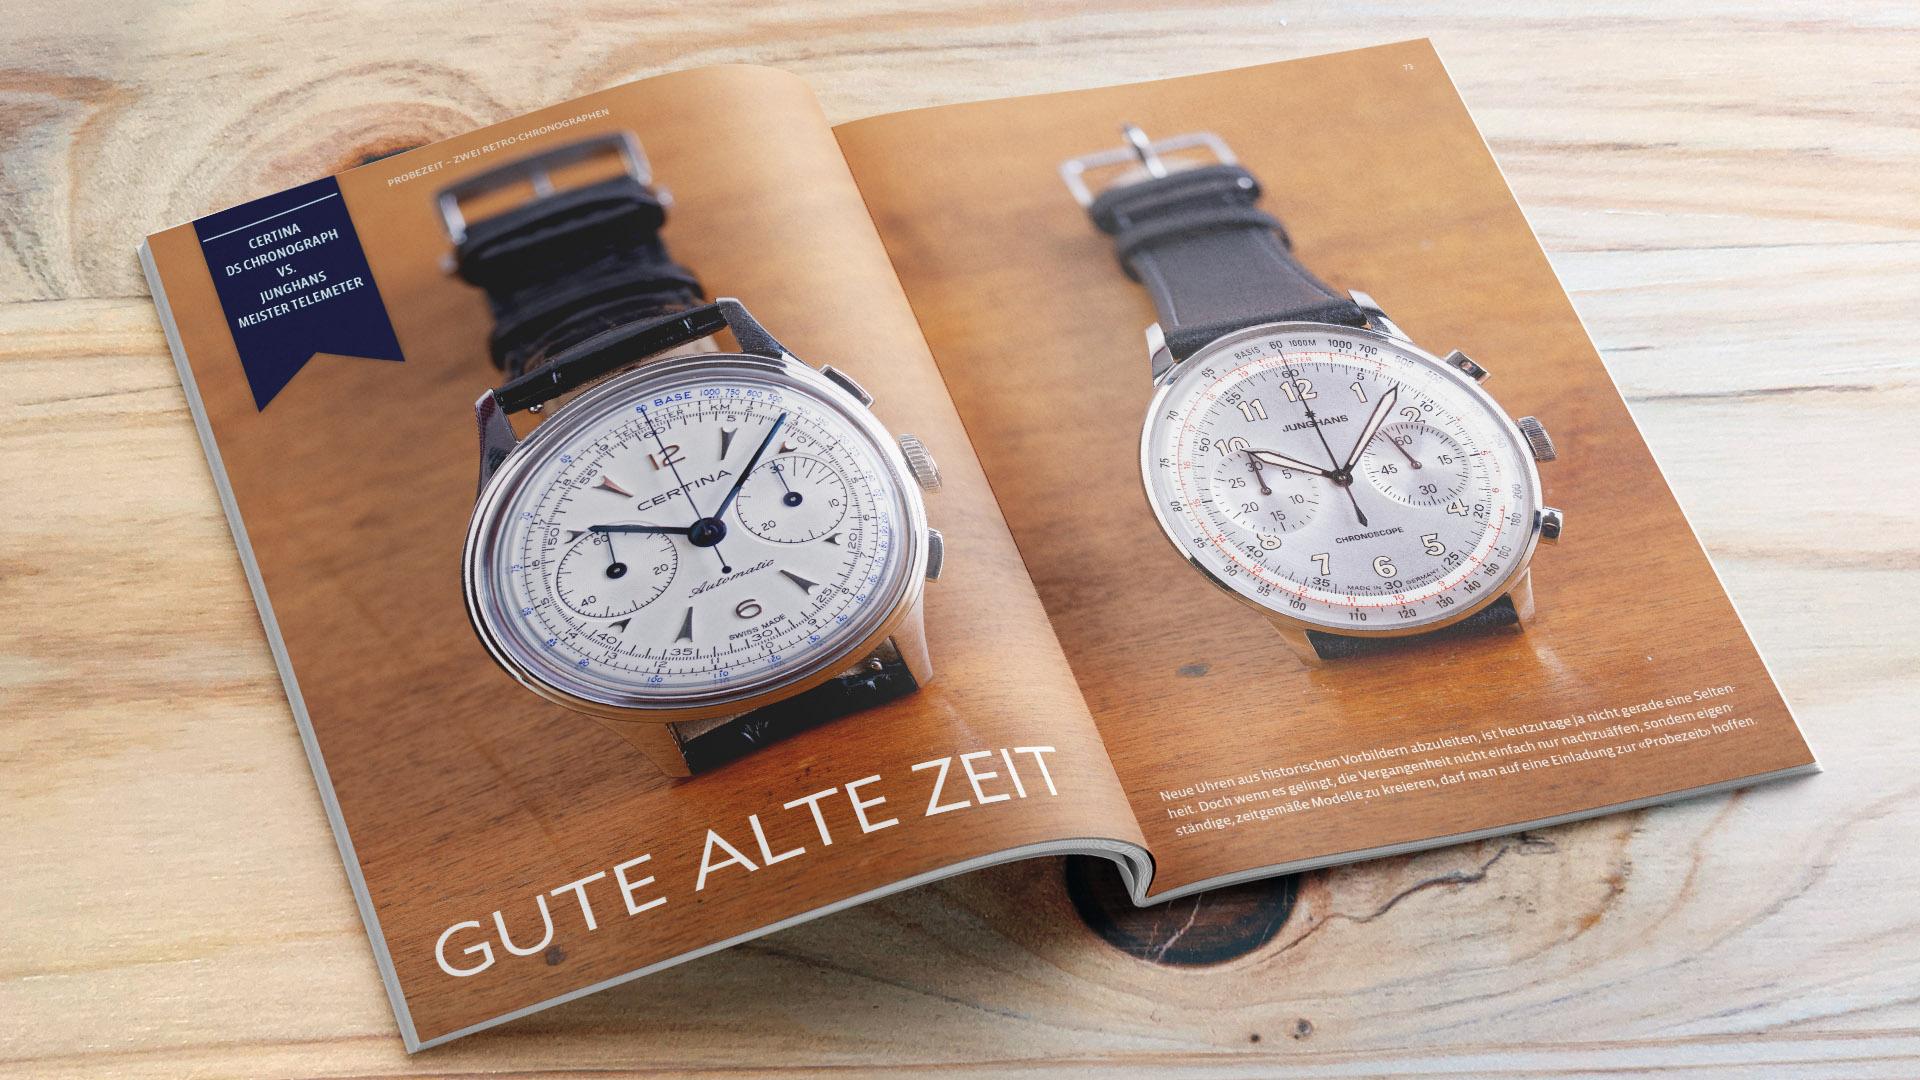 Armbanduhren Probezeit Certina vs Junghans